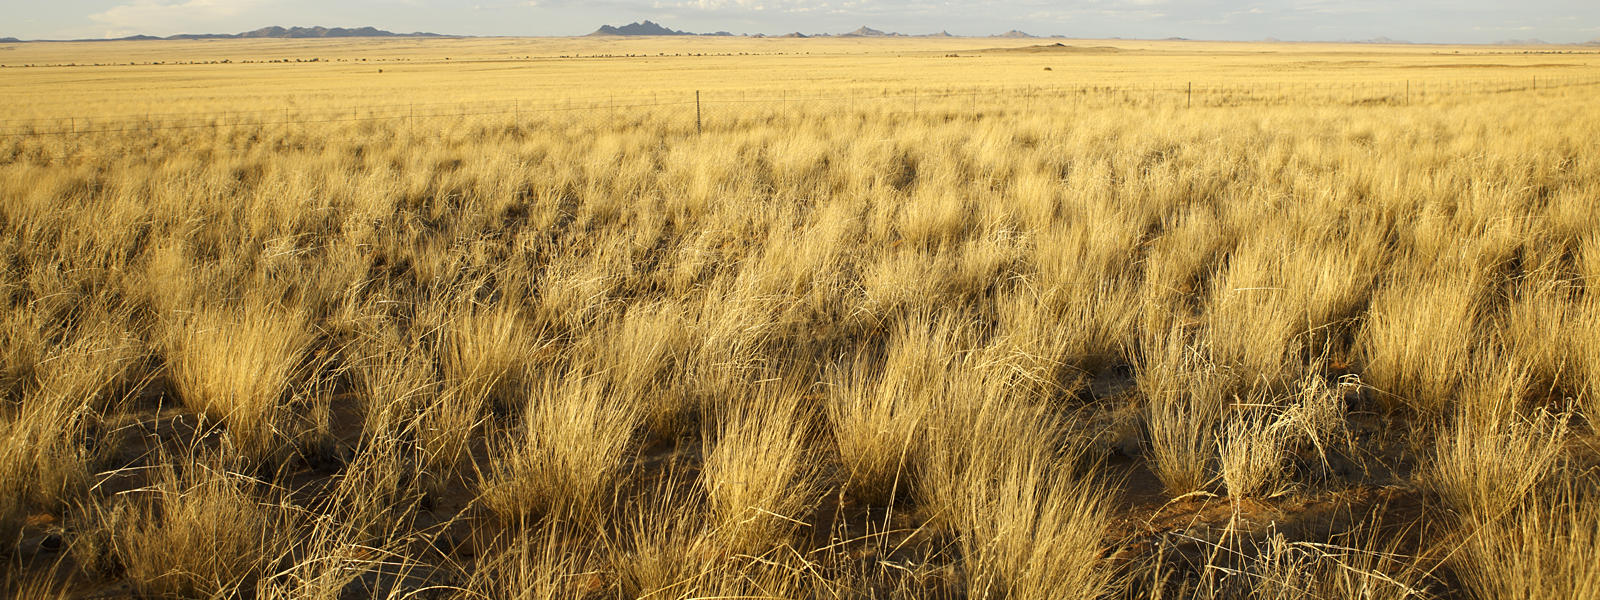 Grasslands Biomes by ert554898   Kristin'-s Grassland Shoebox ...